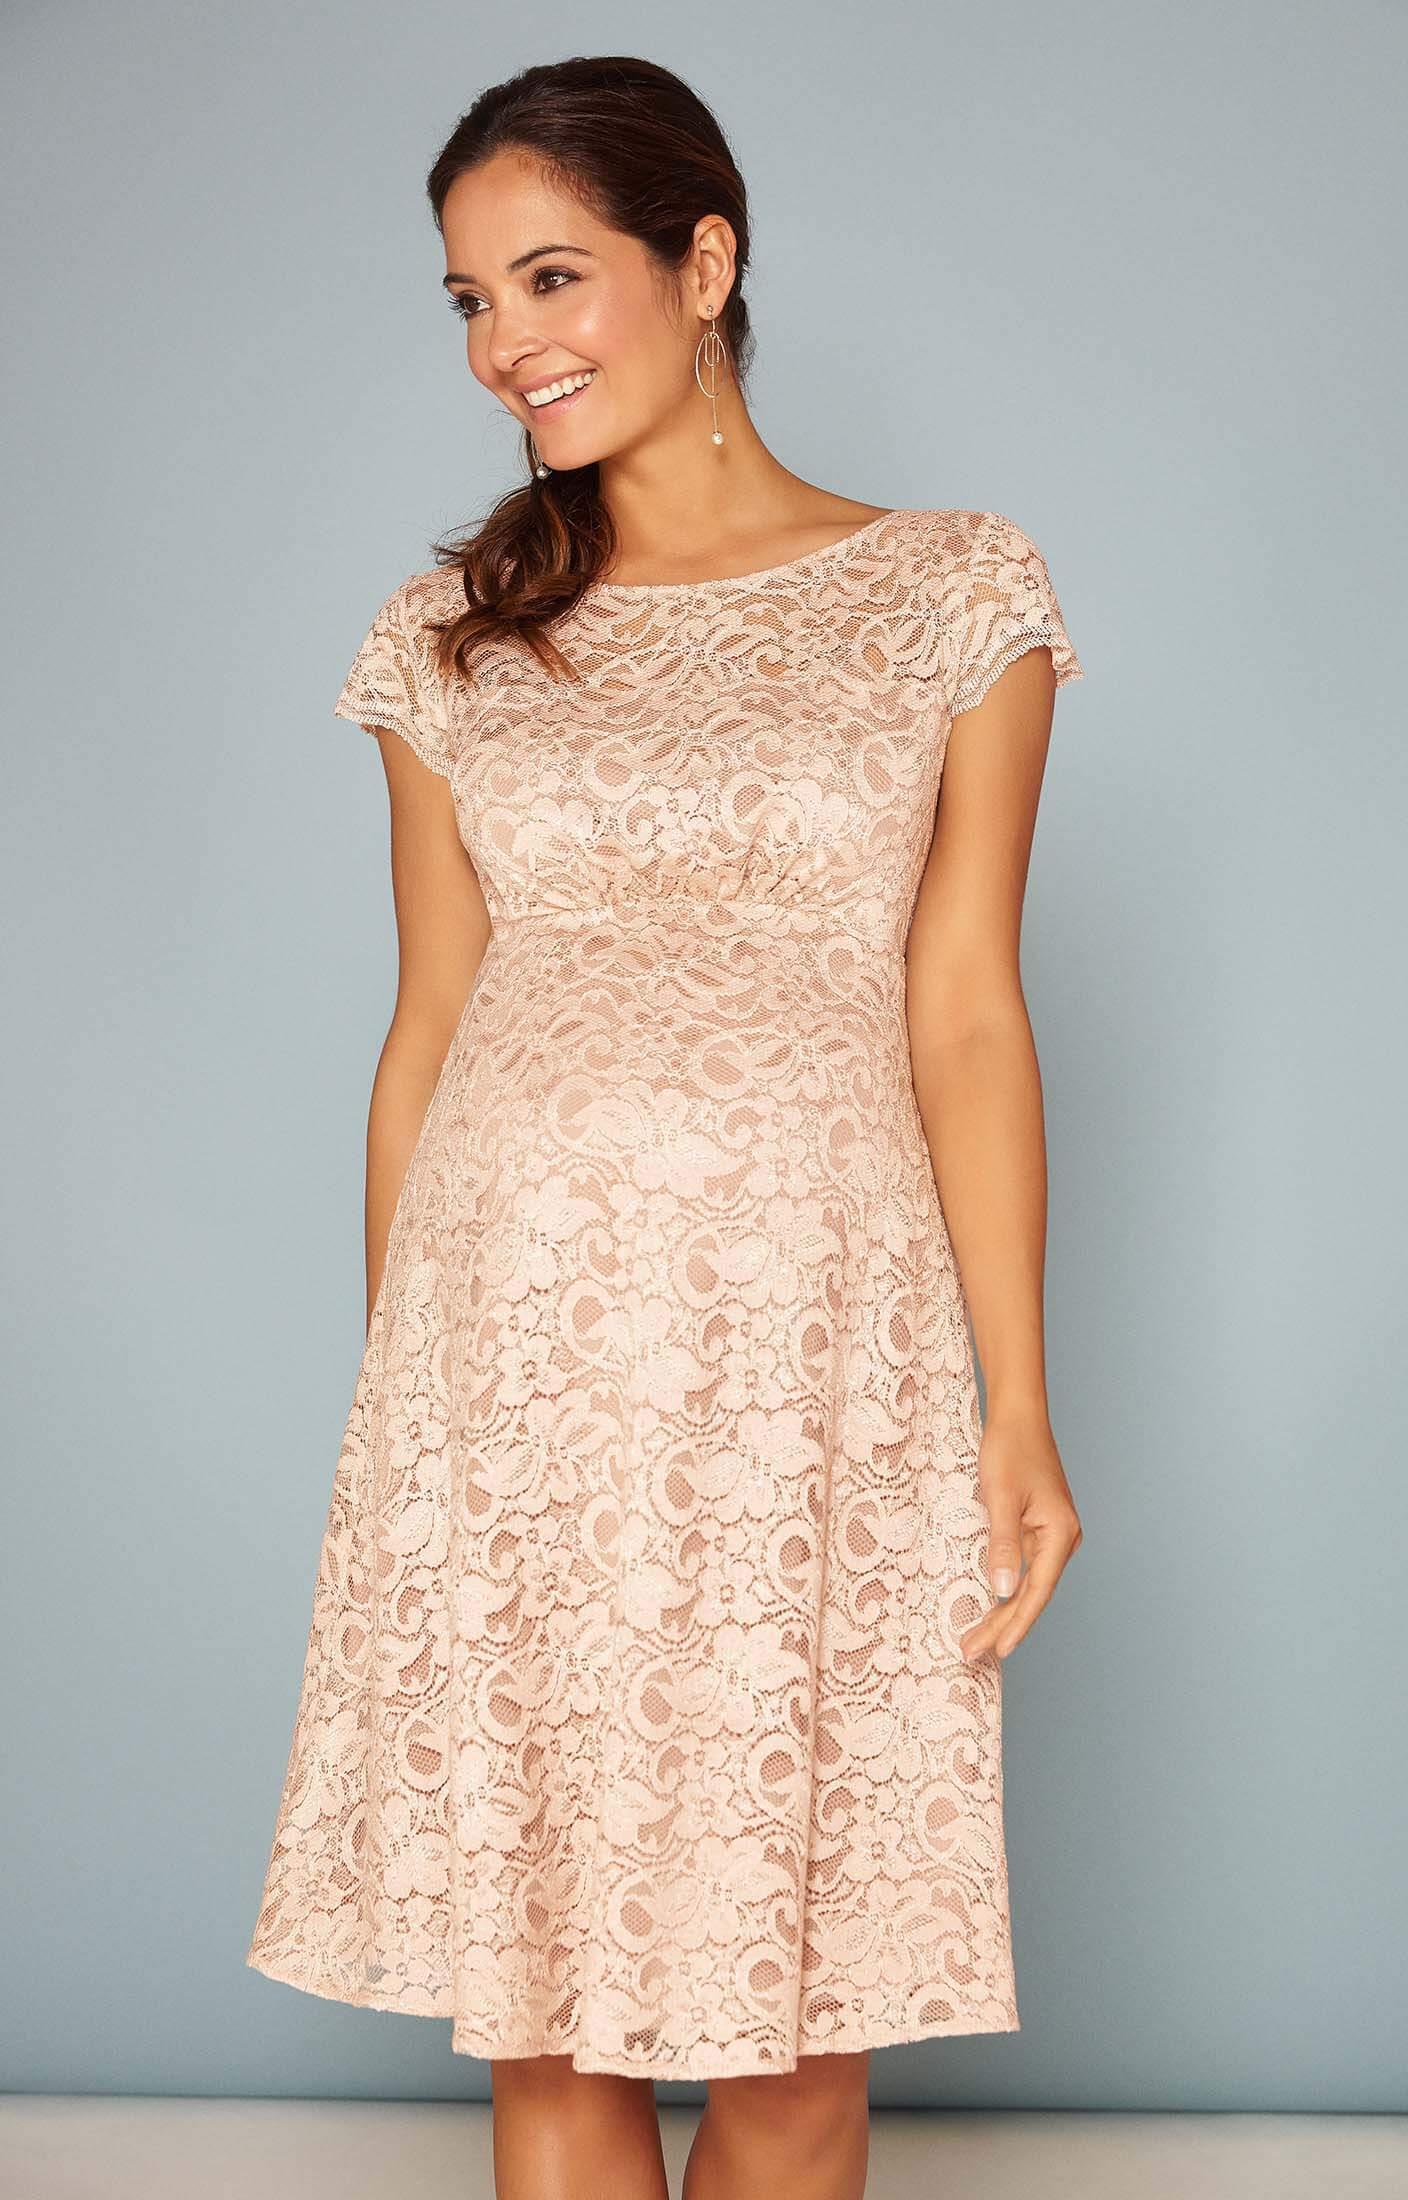 Top Kleid Spitze Rosa Vertrieb Spektakulär Kleid Spitze Rosa Ärmel